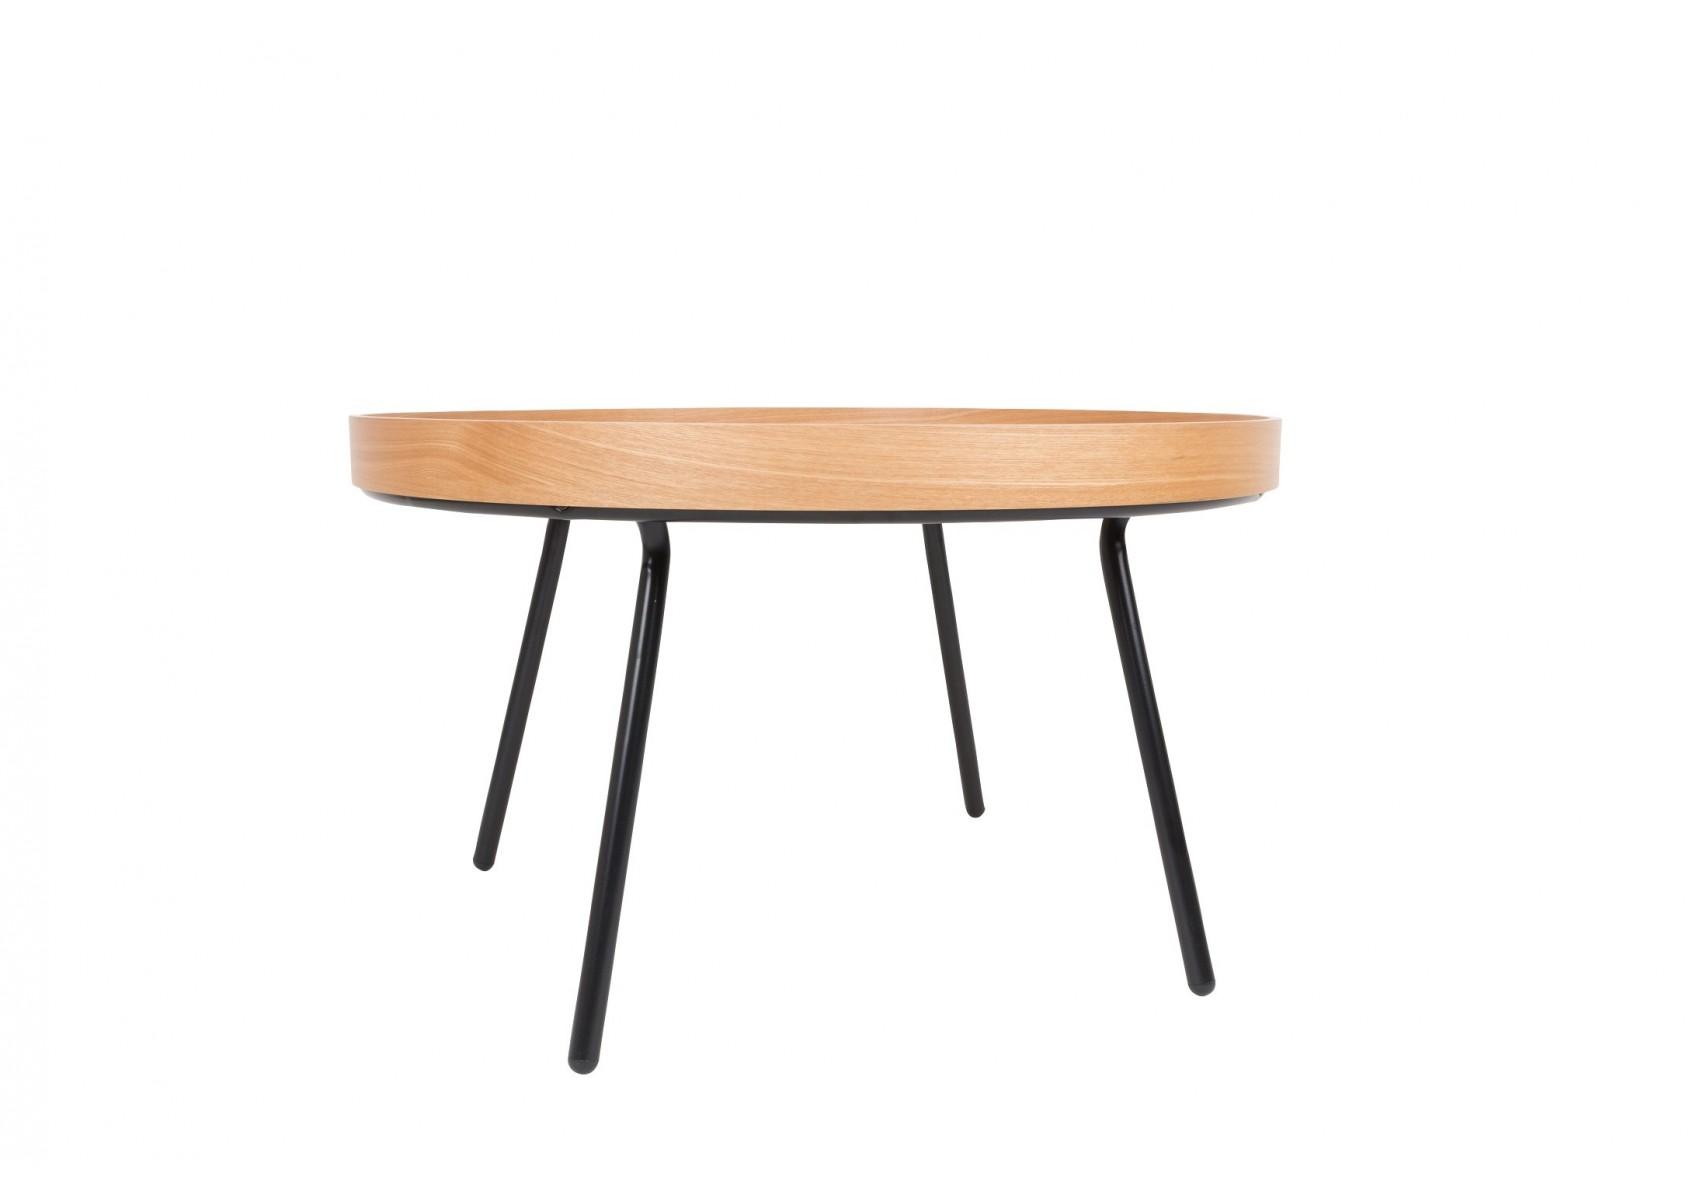 Table basse oak tray plateau mobile design boite - Table basse baroque design ...